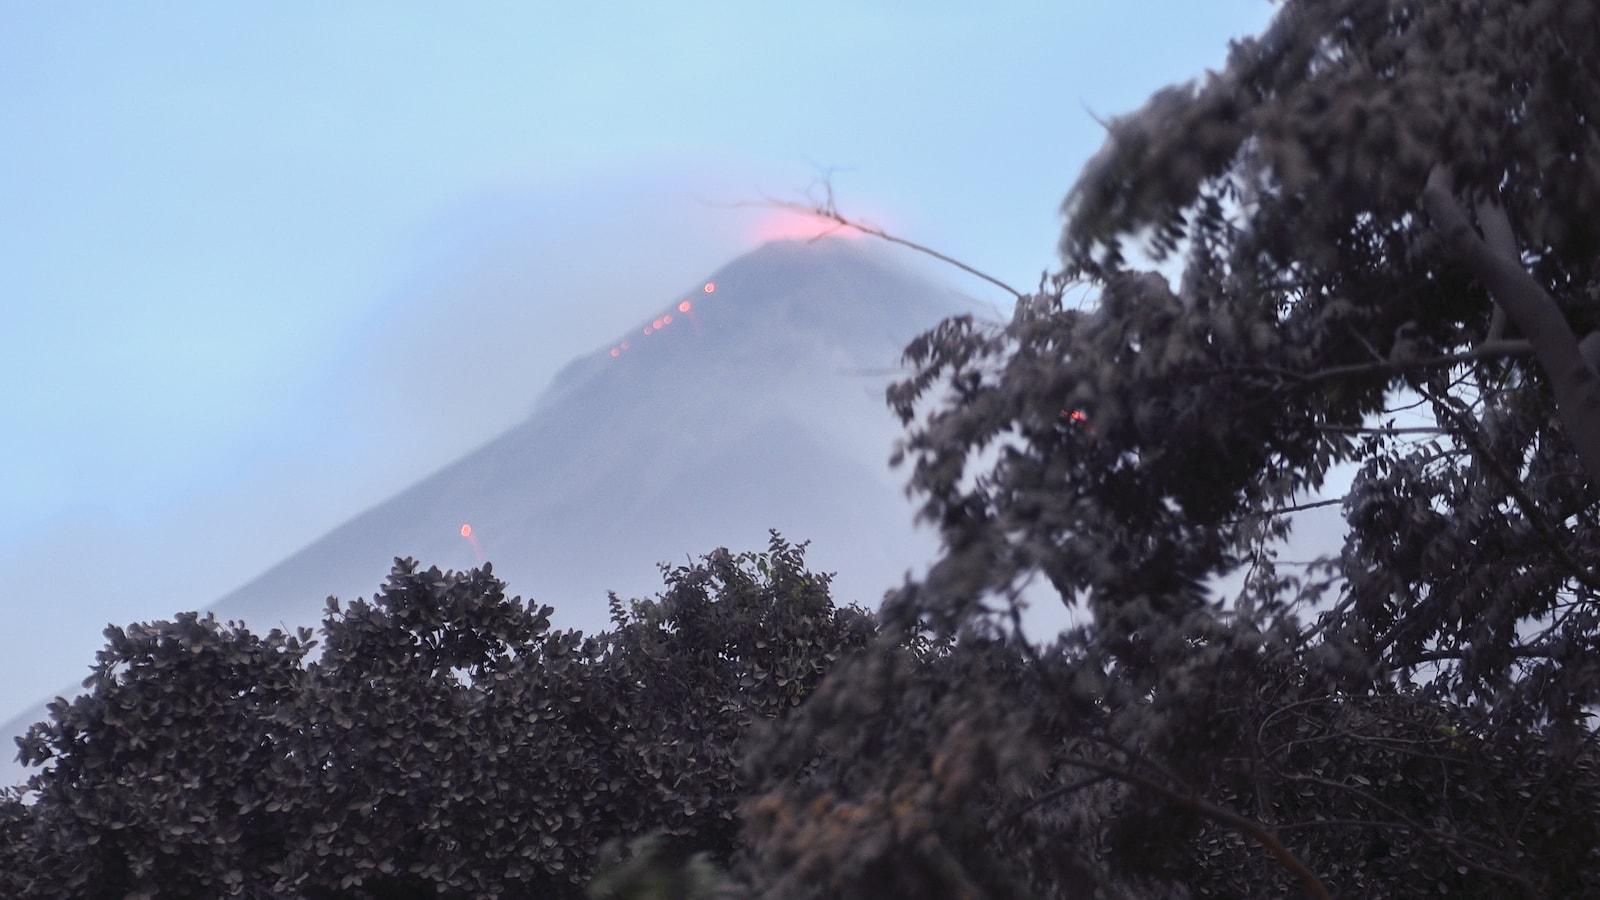 Le volcan de Fuego lors de son éruption, le 3 juin 2018.